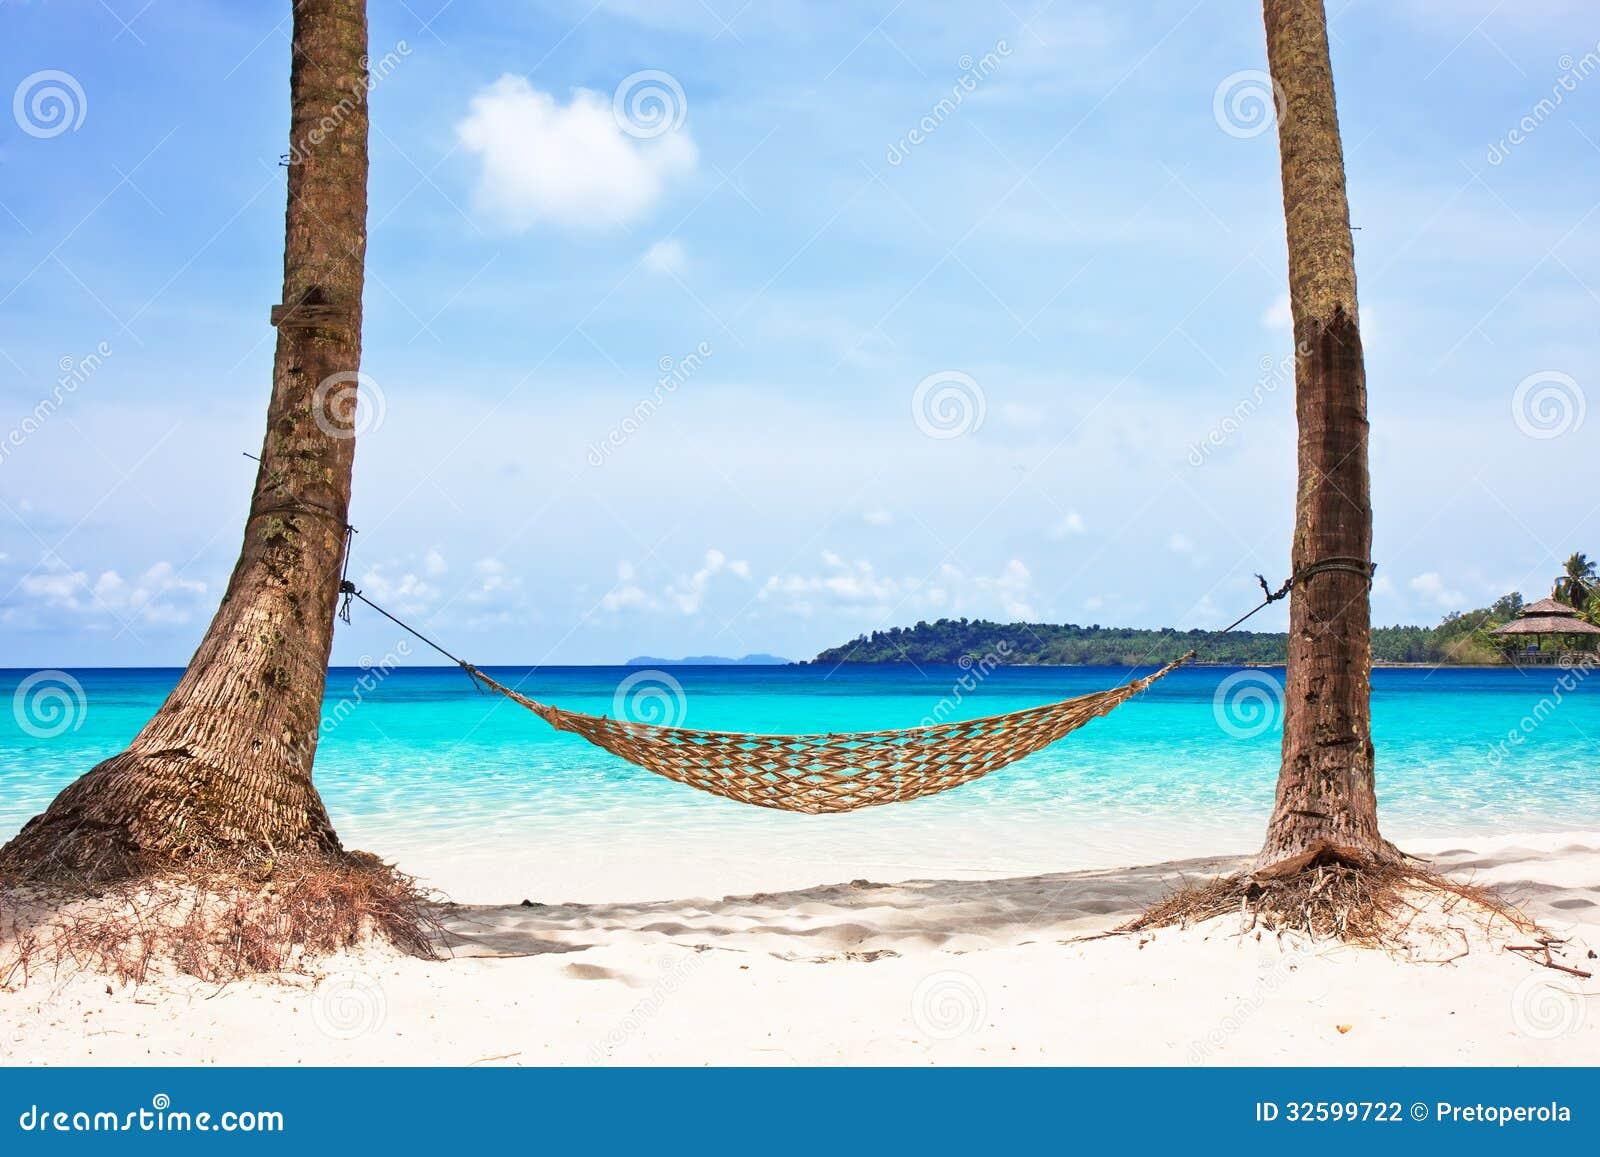 Hammock Between Palm Trees Stock Photography Image 32599722